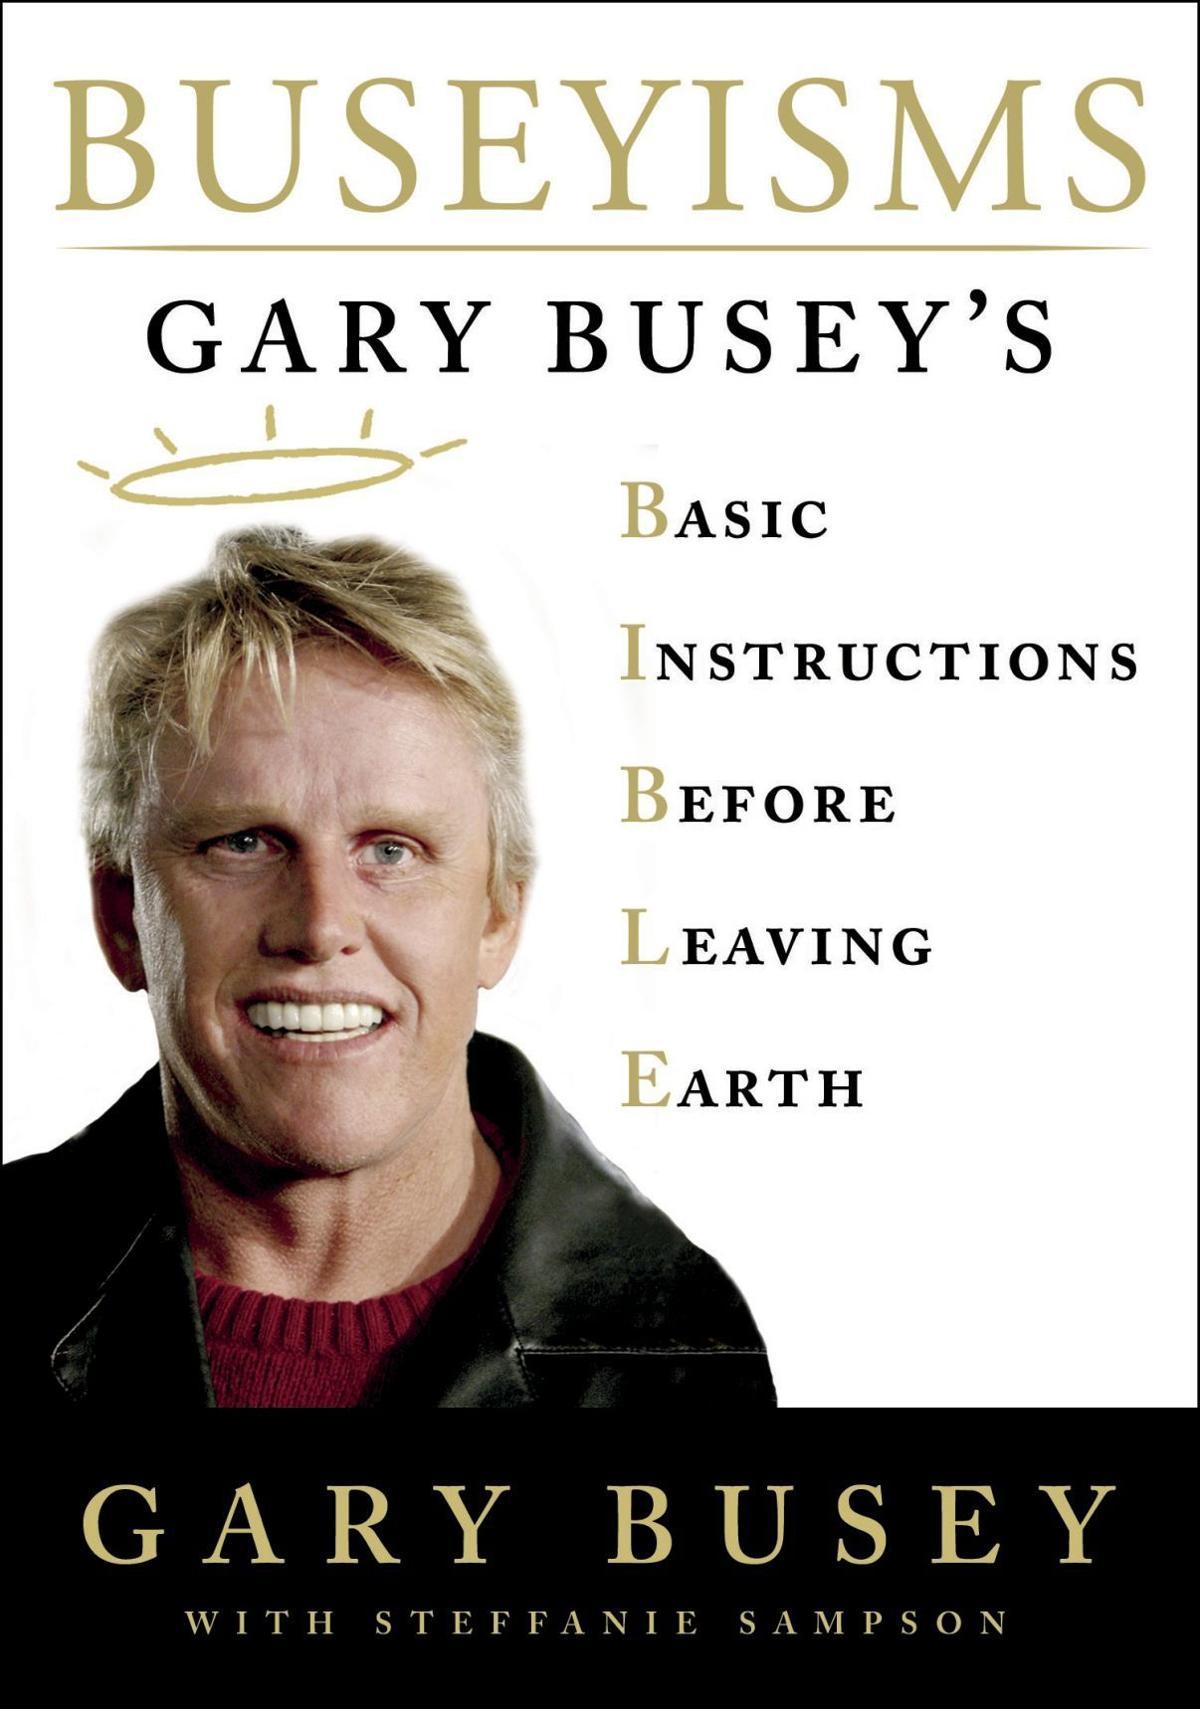 Gary Busey book